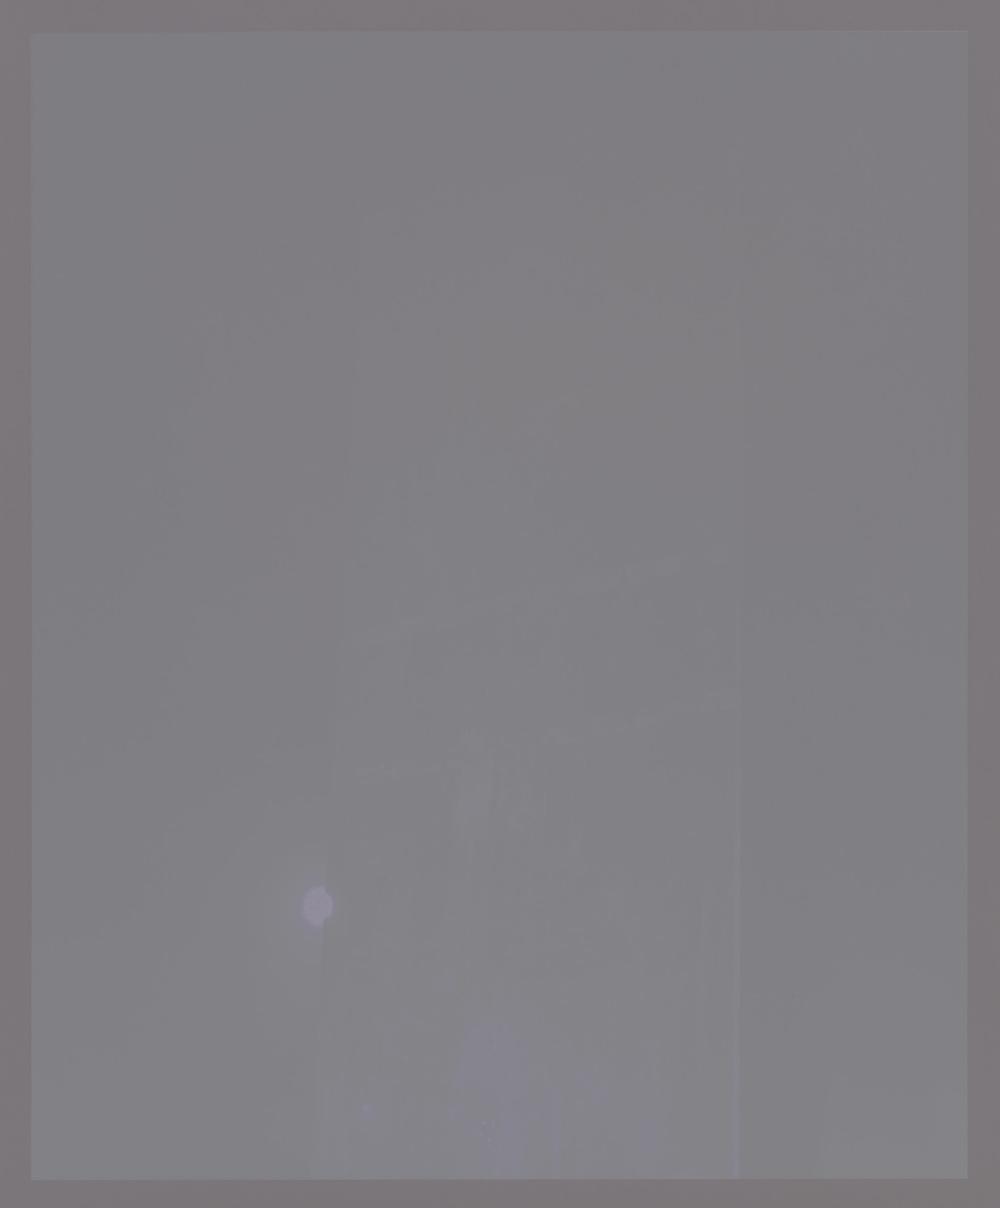 monolith_Moon_02.jpg